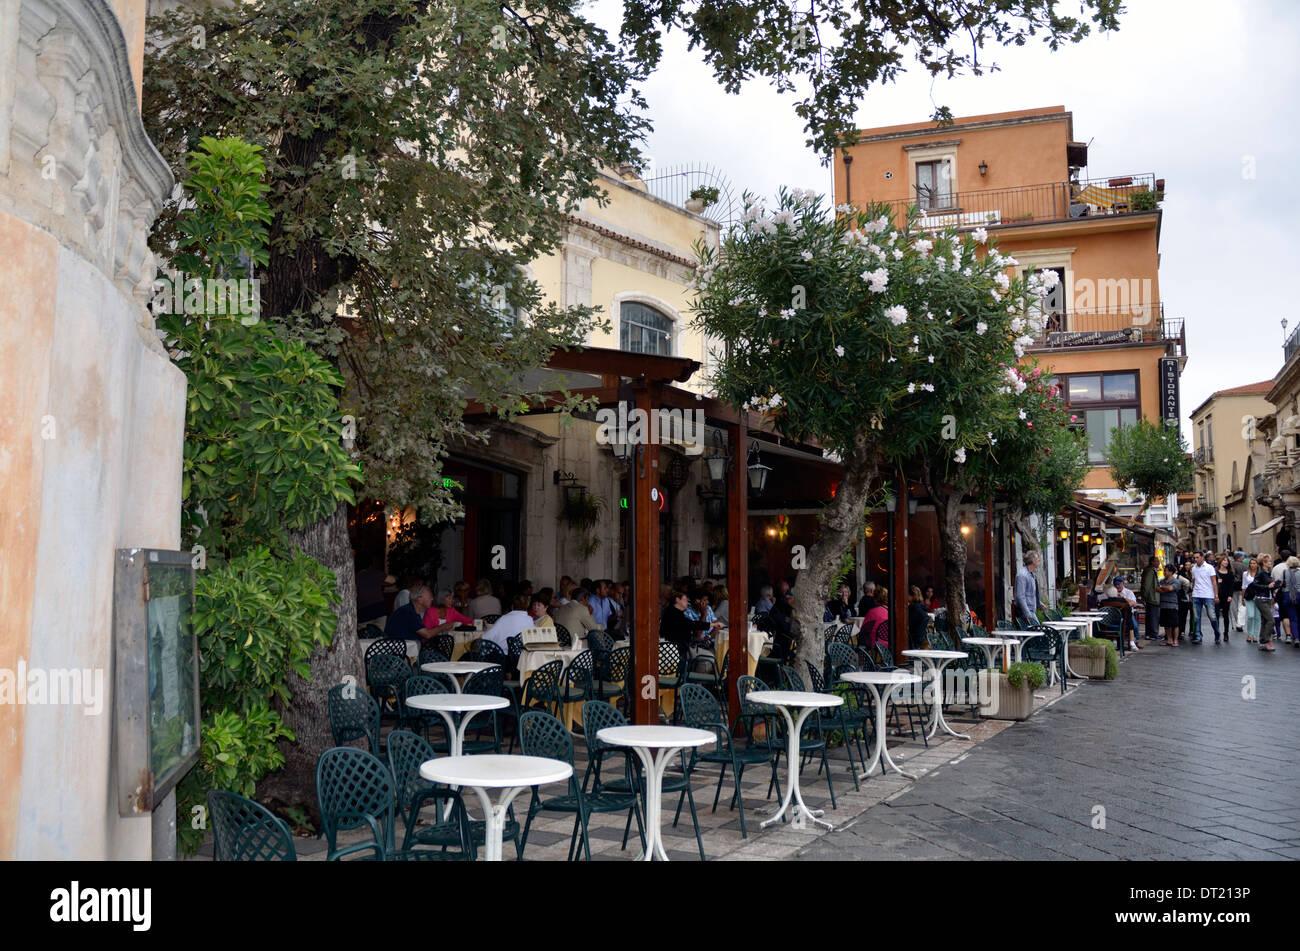 Restaurante, Corsa Umberto I, la calle principal de Taormina, Sicilia, Italia, Europa Imagen De Stock